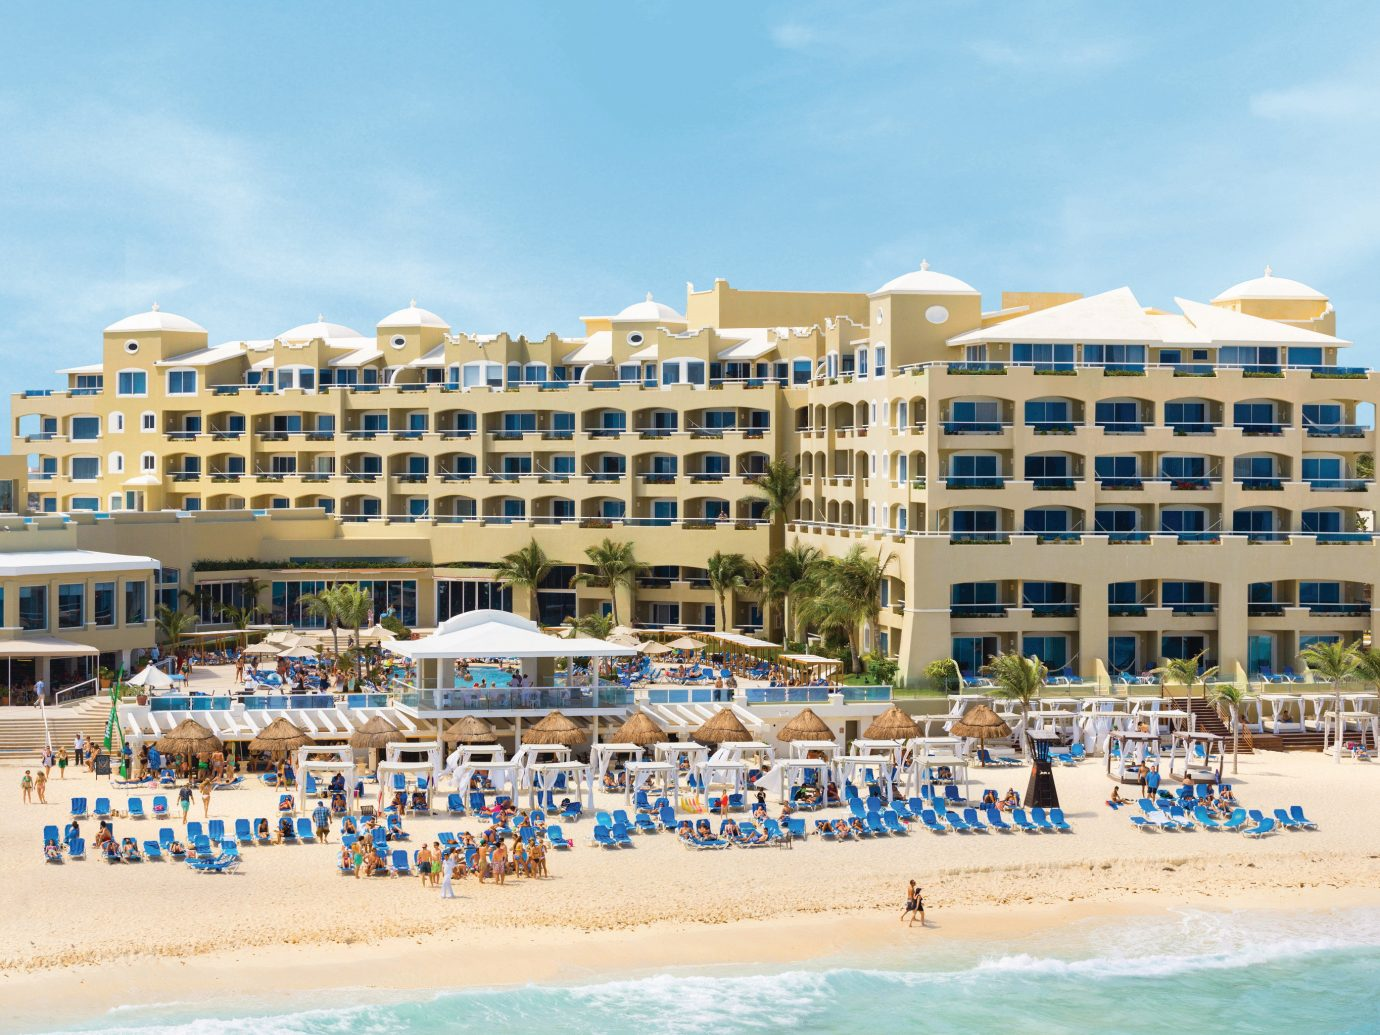 All-Inclusive Resorts Family Travel Hotels Resort leisure Beach vacation tourism hotel Sea resort town swimming pool real estate condominium caribbean